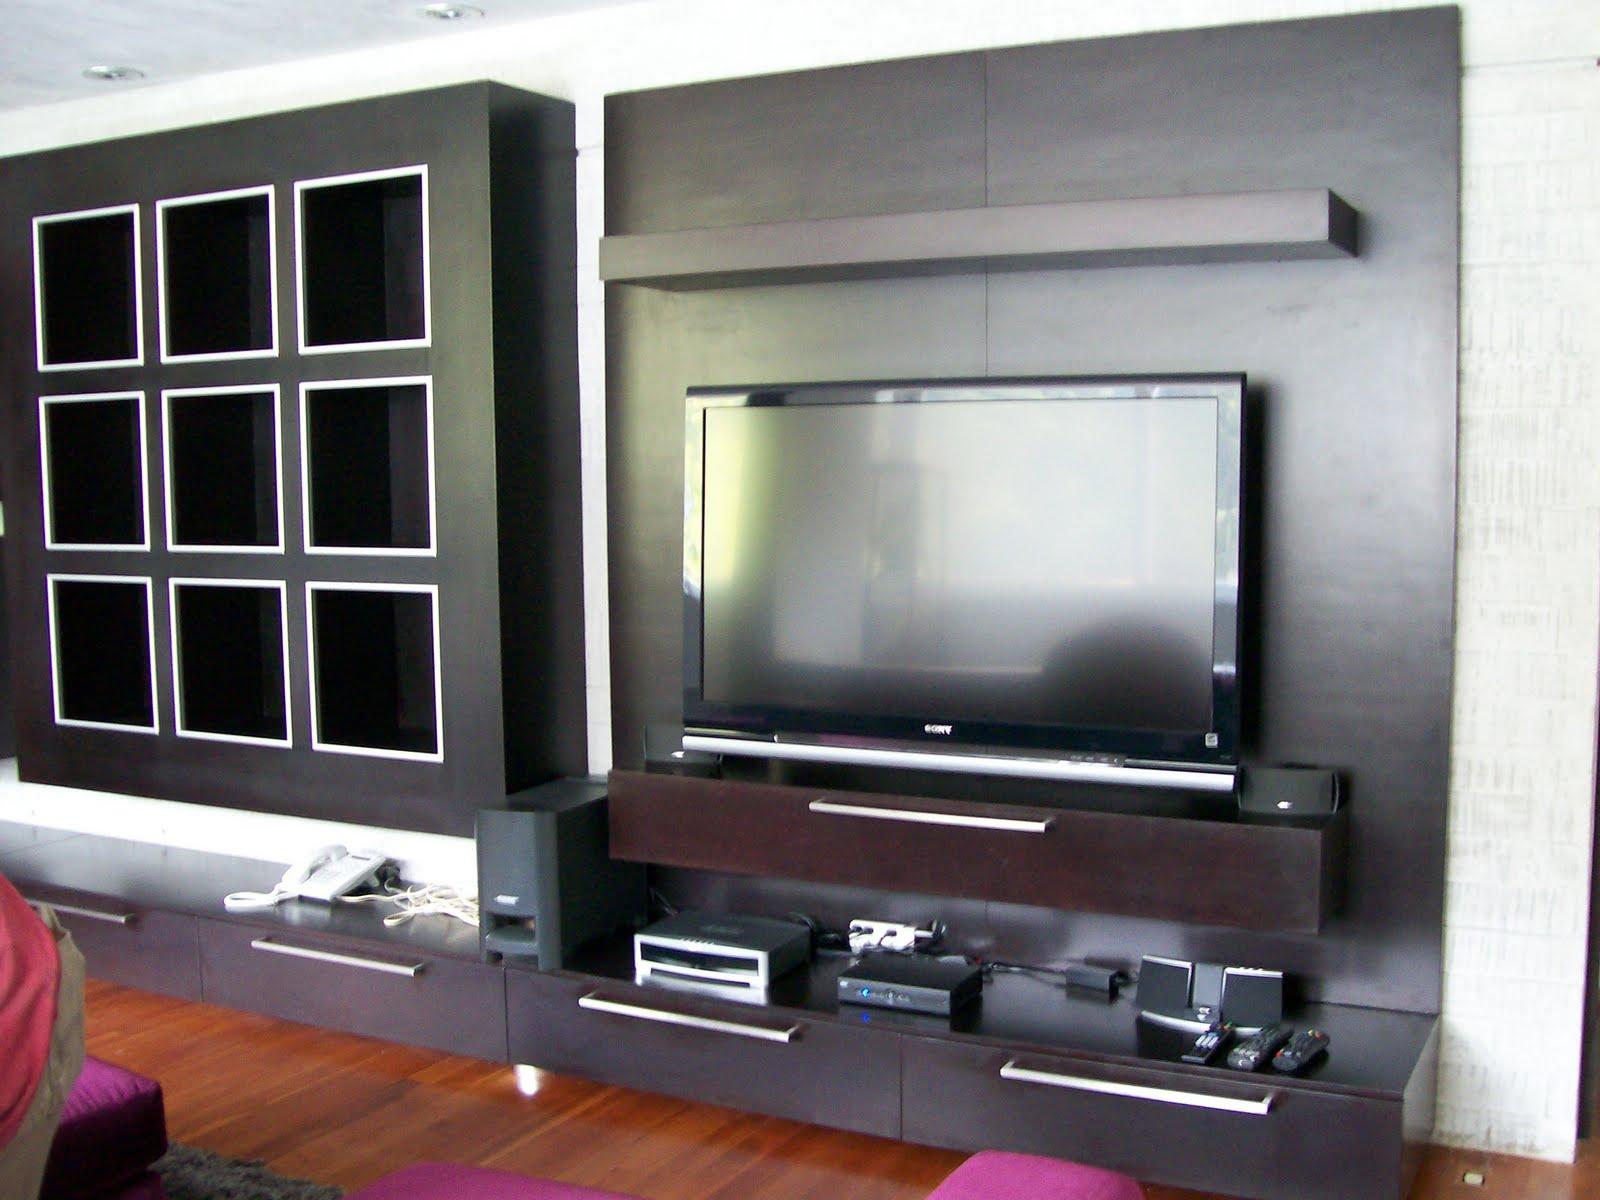 Muebles sobre dise o avl muebles para t v for Muebles television diseno